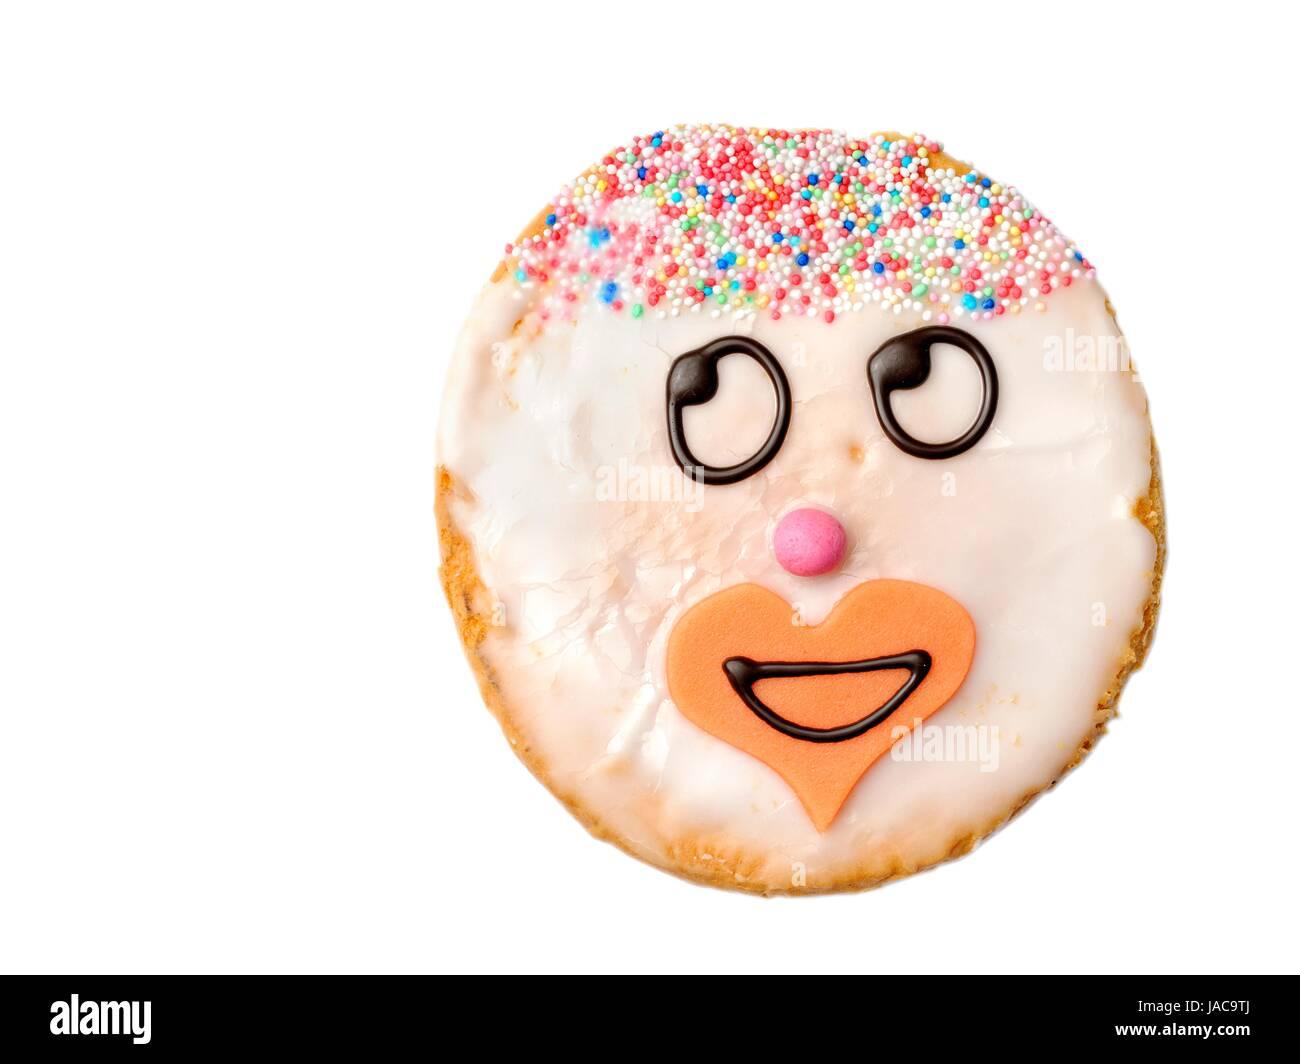 teegebäck, gebäck, backwaren, kleingebäck, keks, buttergebäck, mürbeteig, feingebäck, kaffeegebäck, zucker, süß, Stock Photo